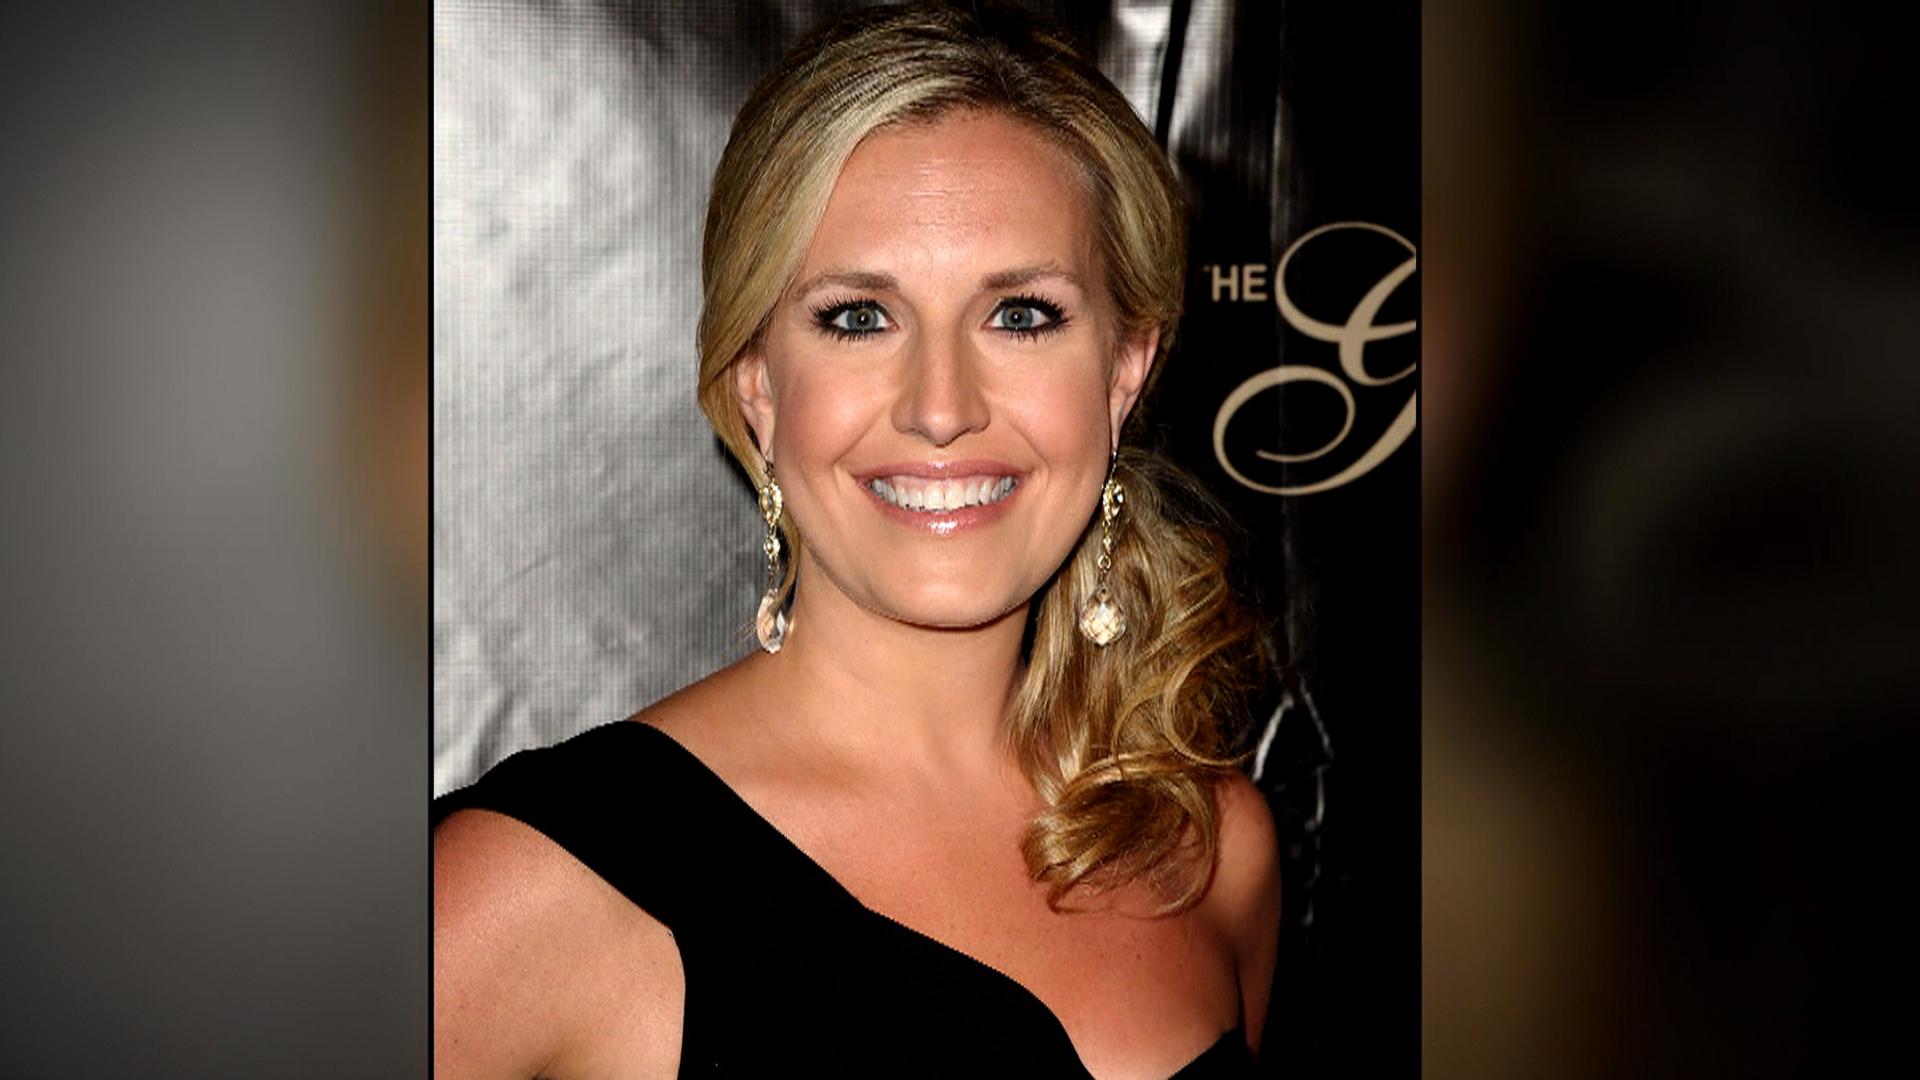 Pregnant CNN anchor Poppy Harlow faints on air, drawing ...